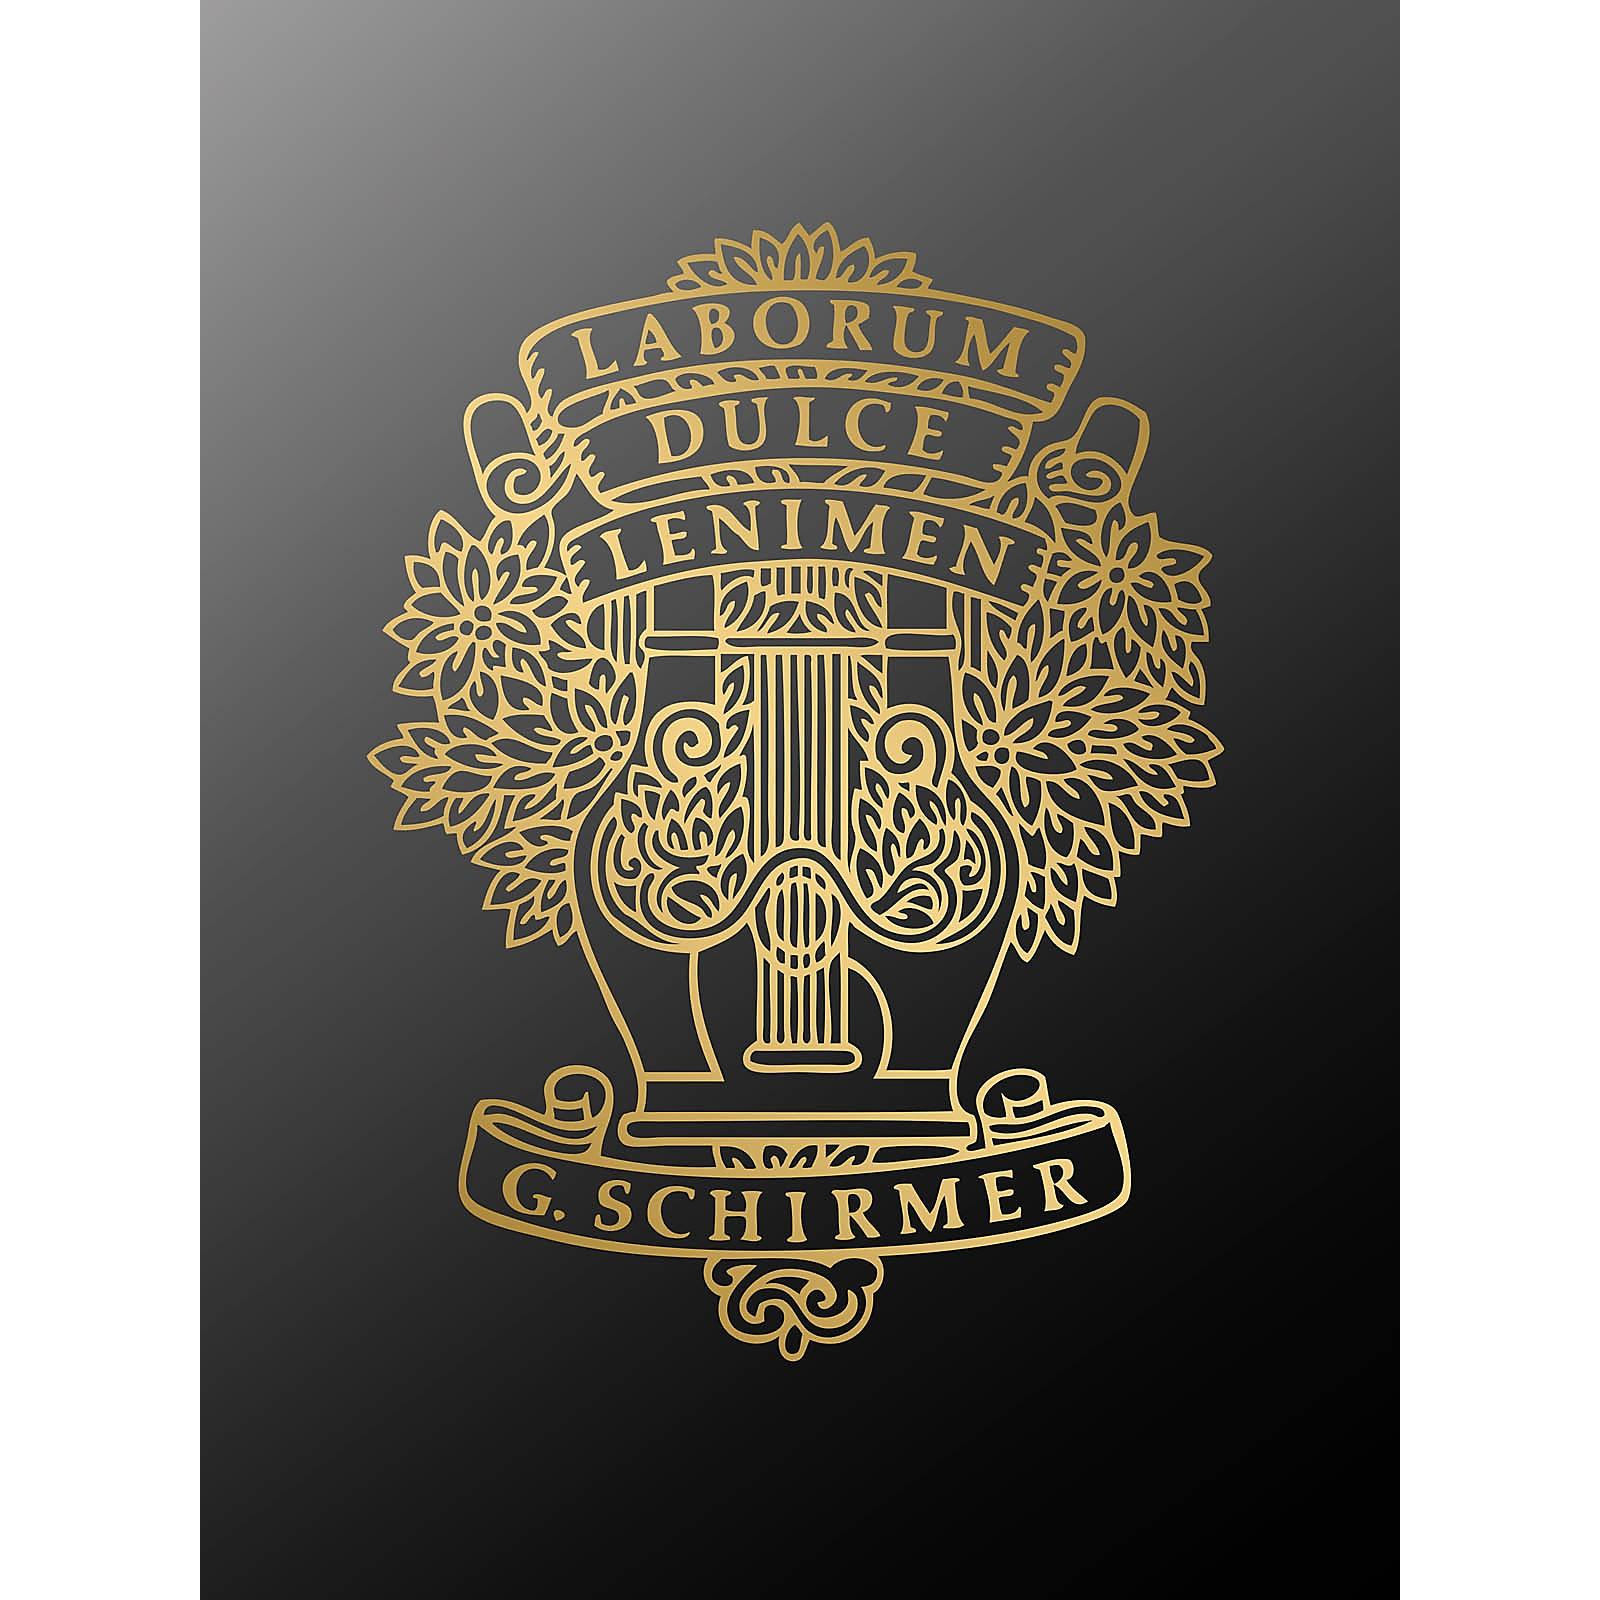 G. Schirmer The Lord's Prayer Vocal Ensemble Series  by Albert Hay Malotte Edited by Carl Deis